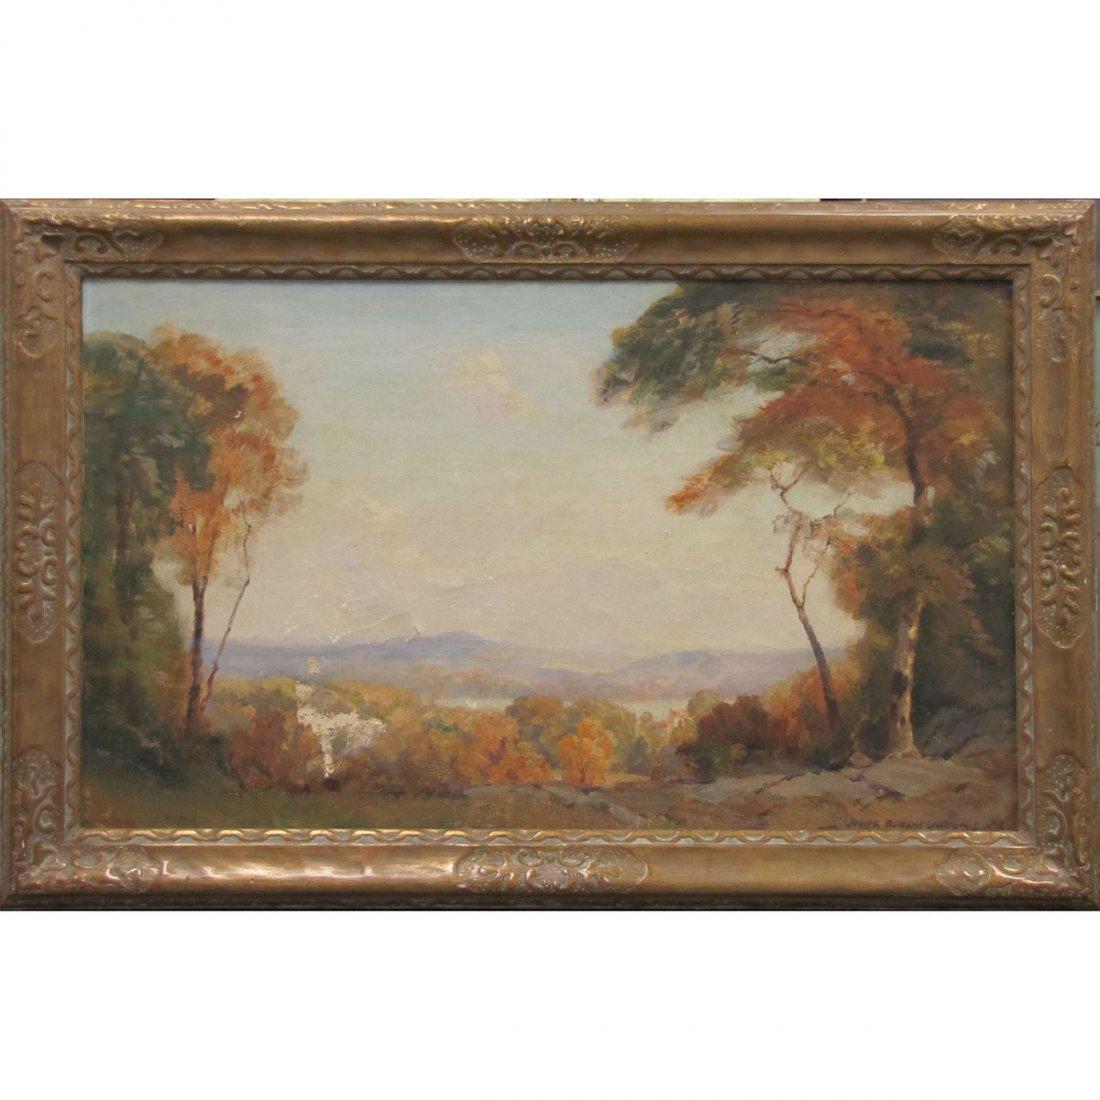 FREDERICK BALLARD WILLIAMS (NY/NJ 1871-1956), OIL